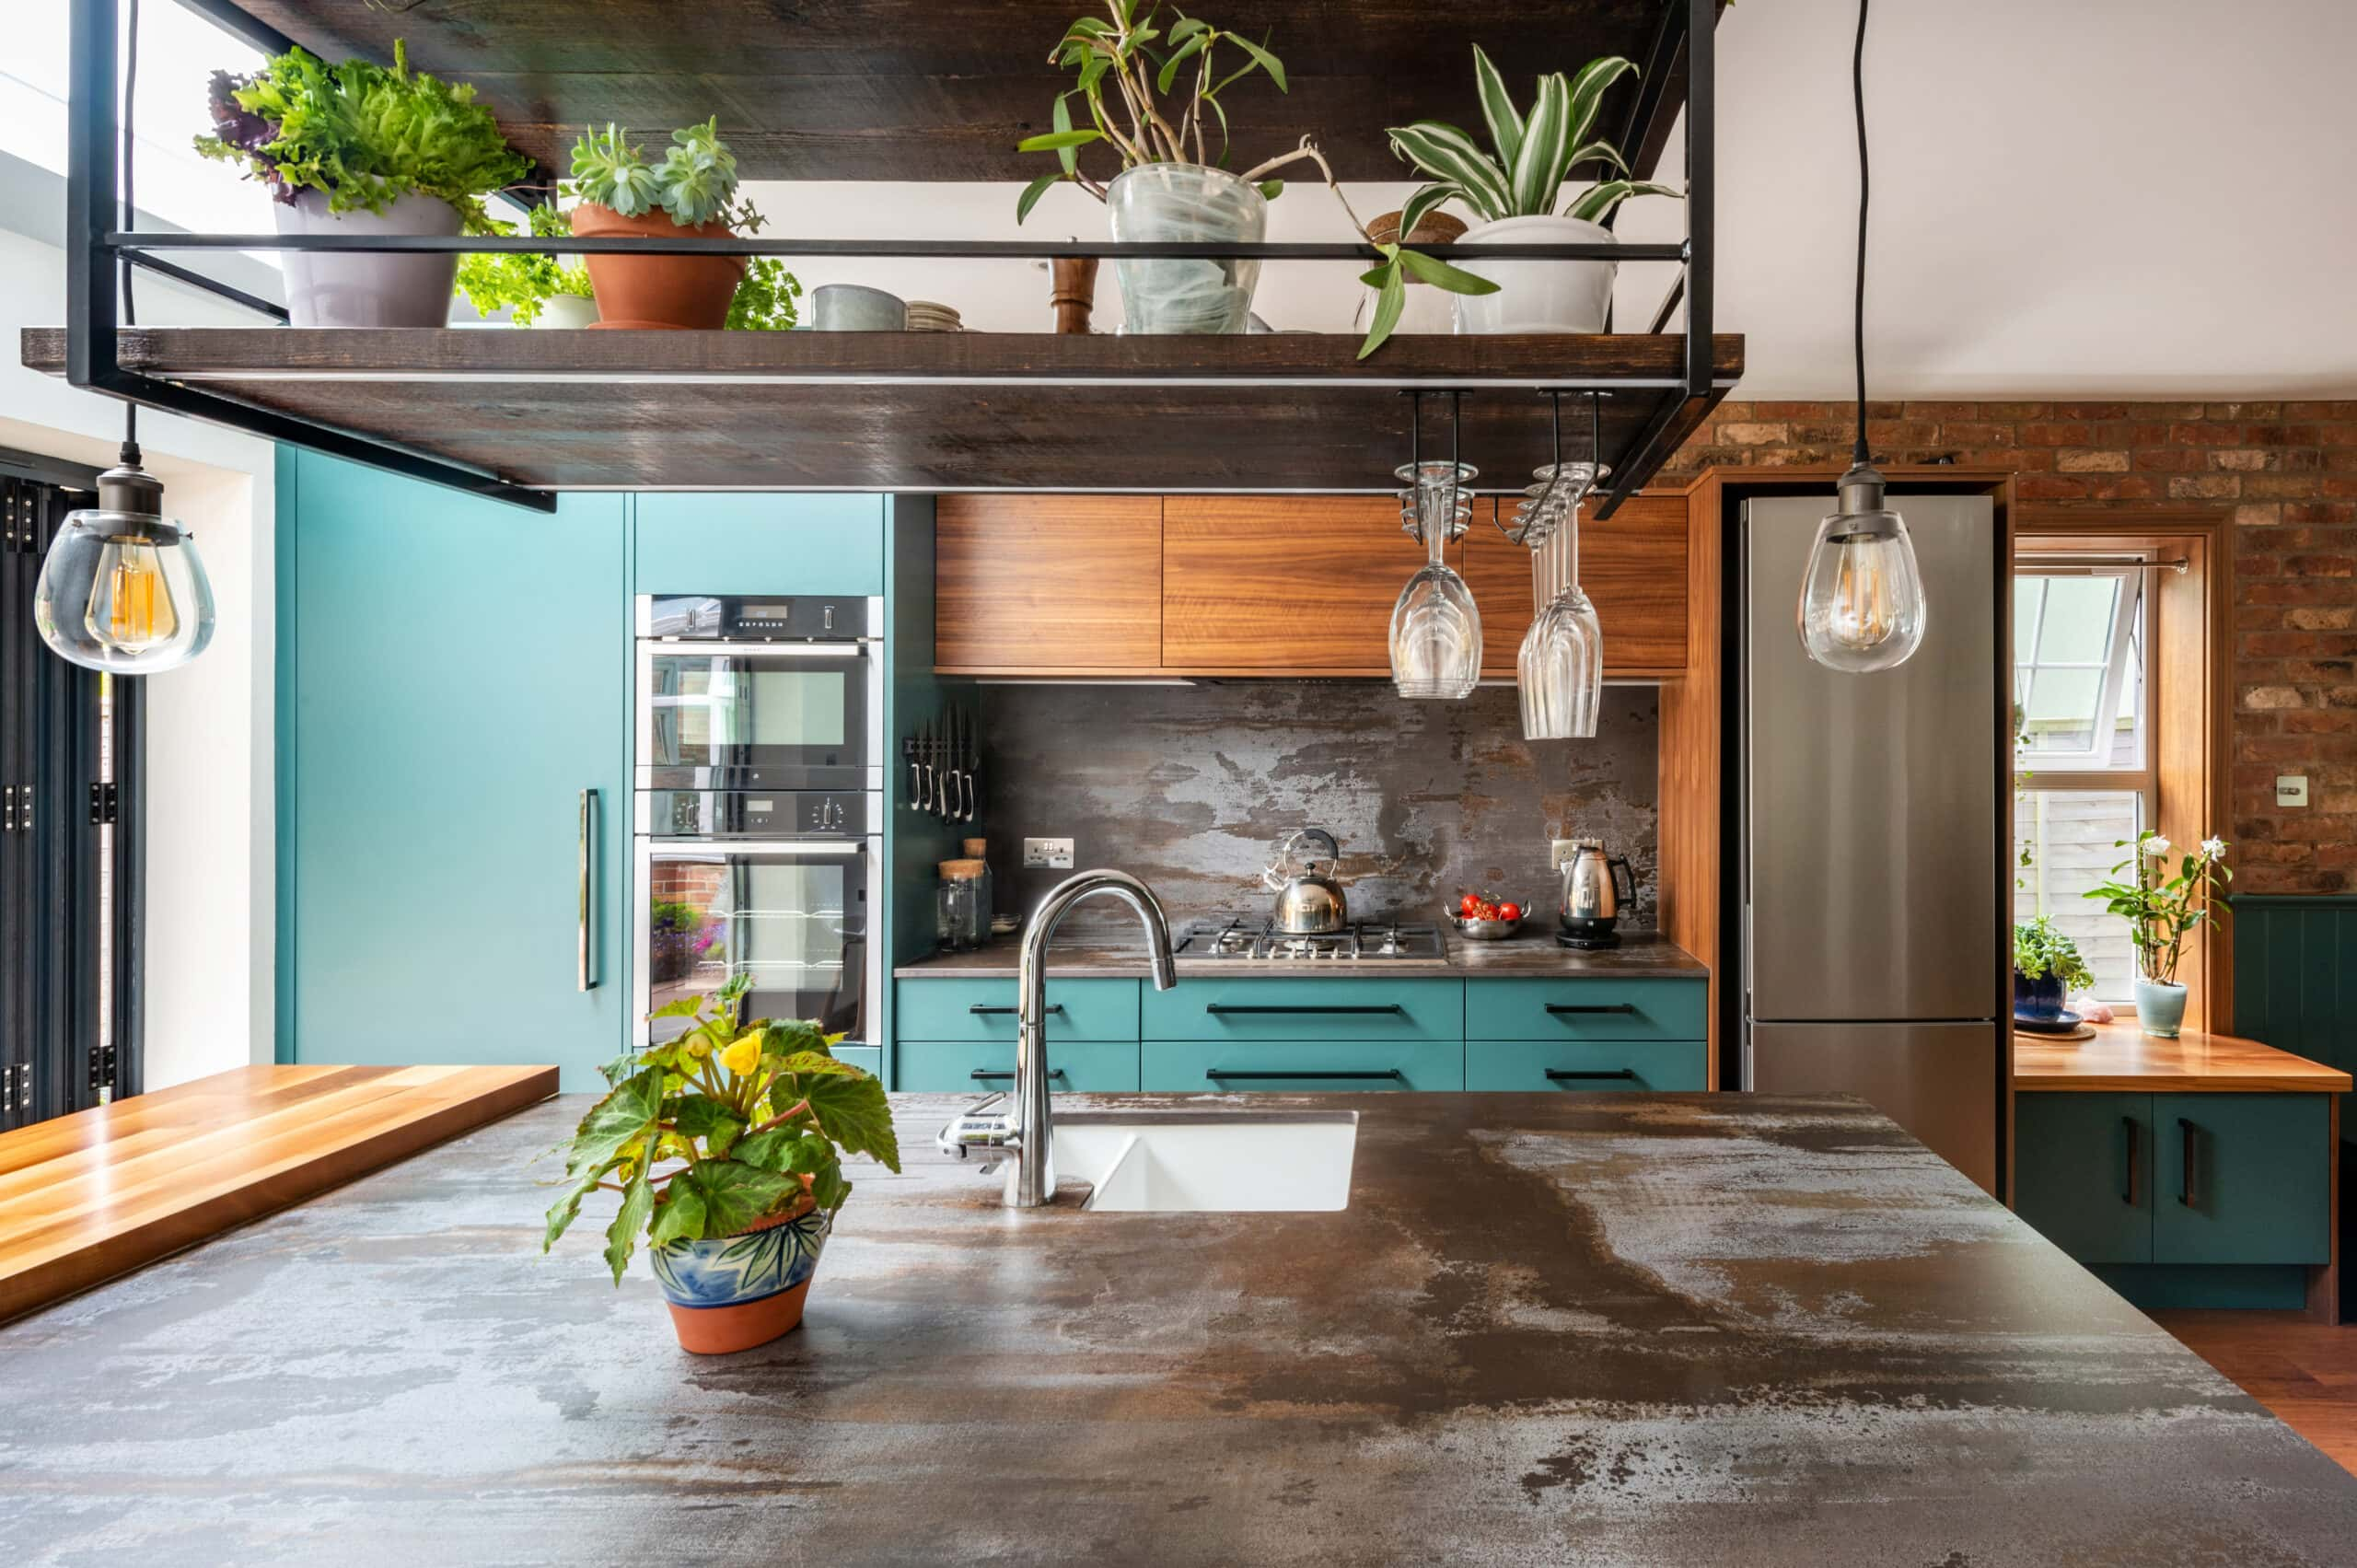 stone-chat-kitchen-6